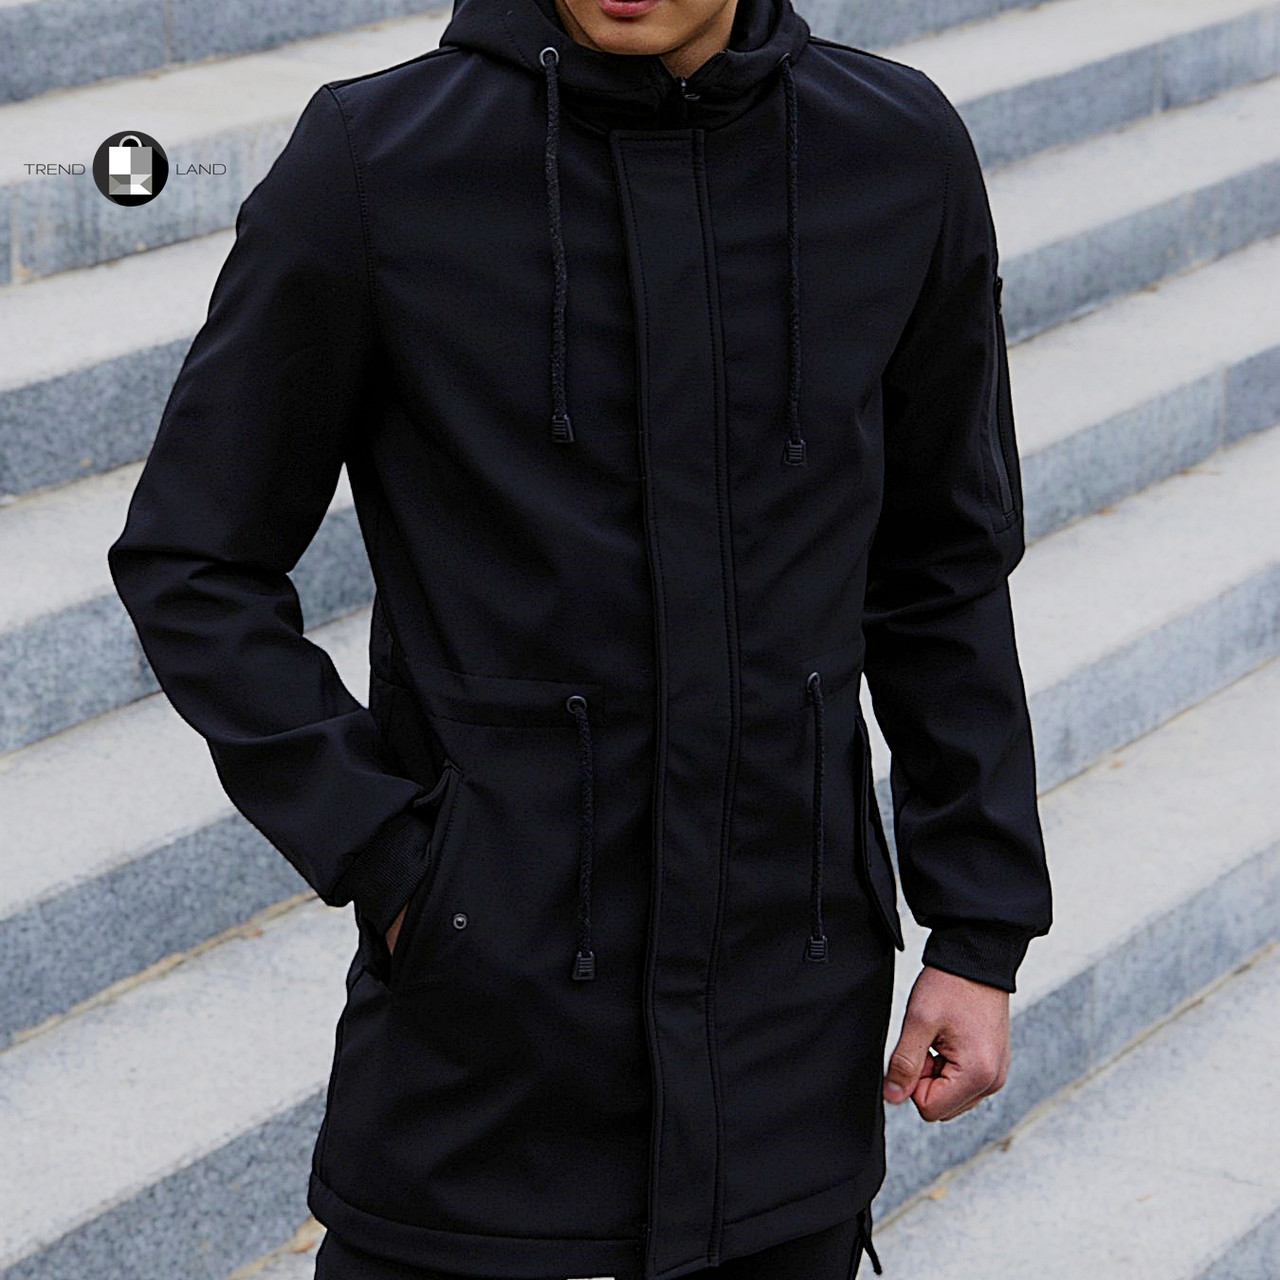 Розміри S-2XL | Чоловіча куртка Intruder Softshell V2.0 Black Чорна